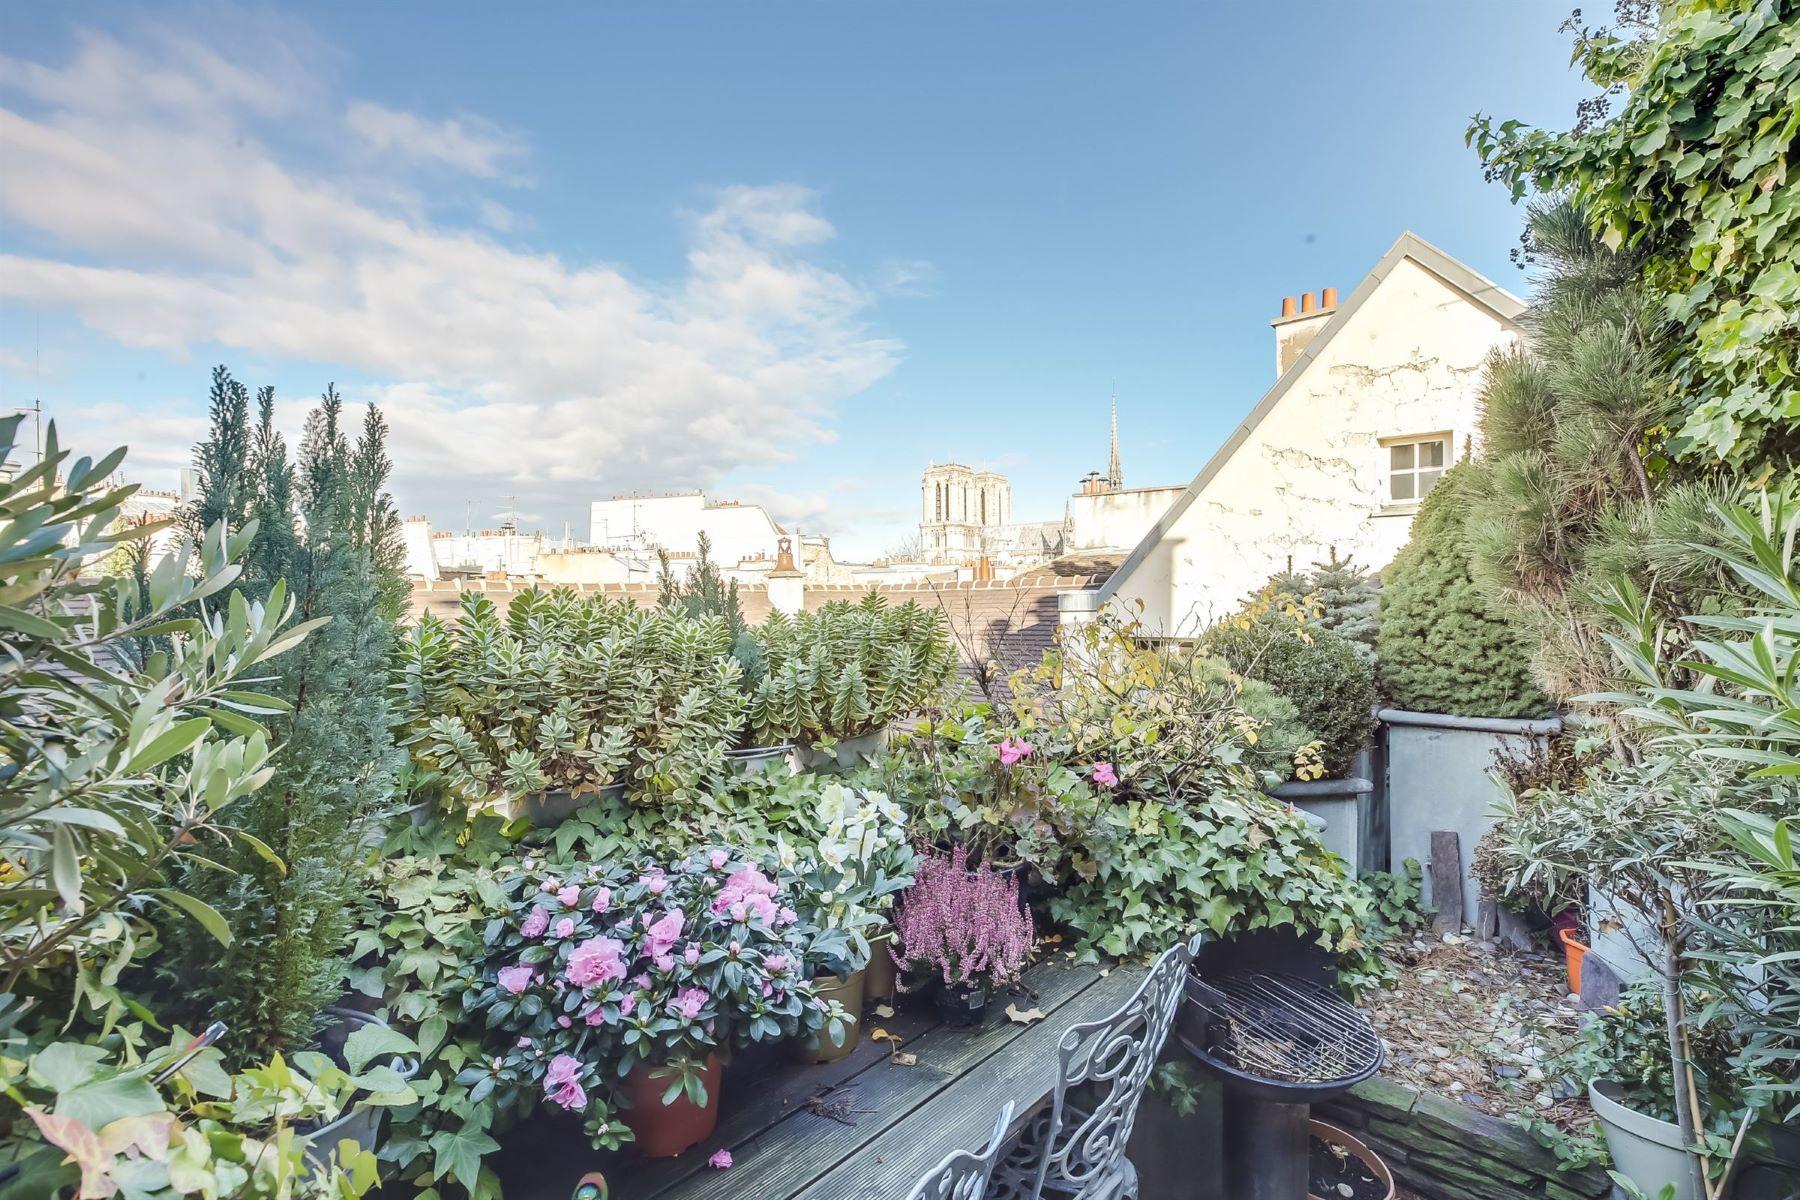 Single Family Homes for Active at Private mansion in Paris 5th - Quartier Latin Paris, Ile-De-France 75005 France